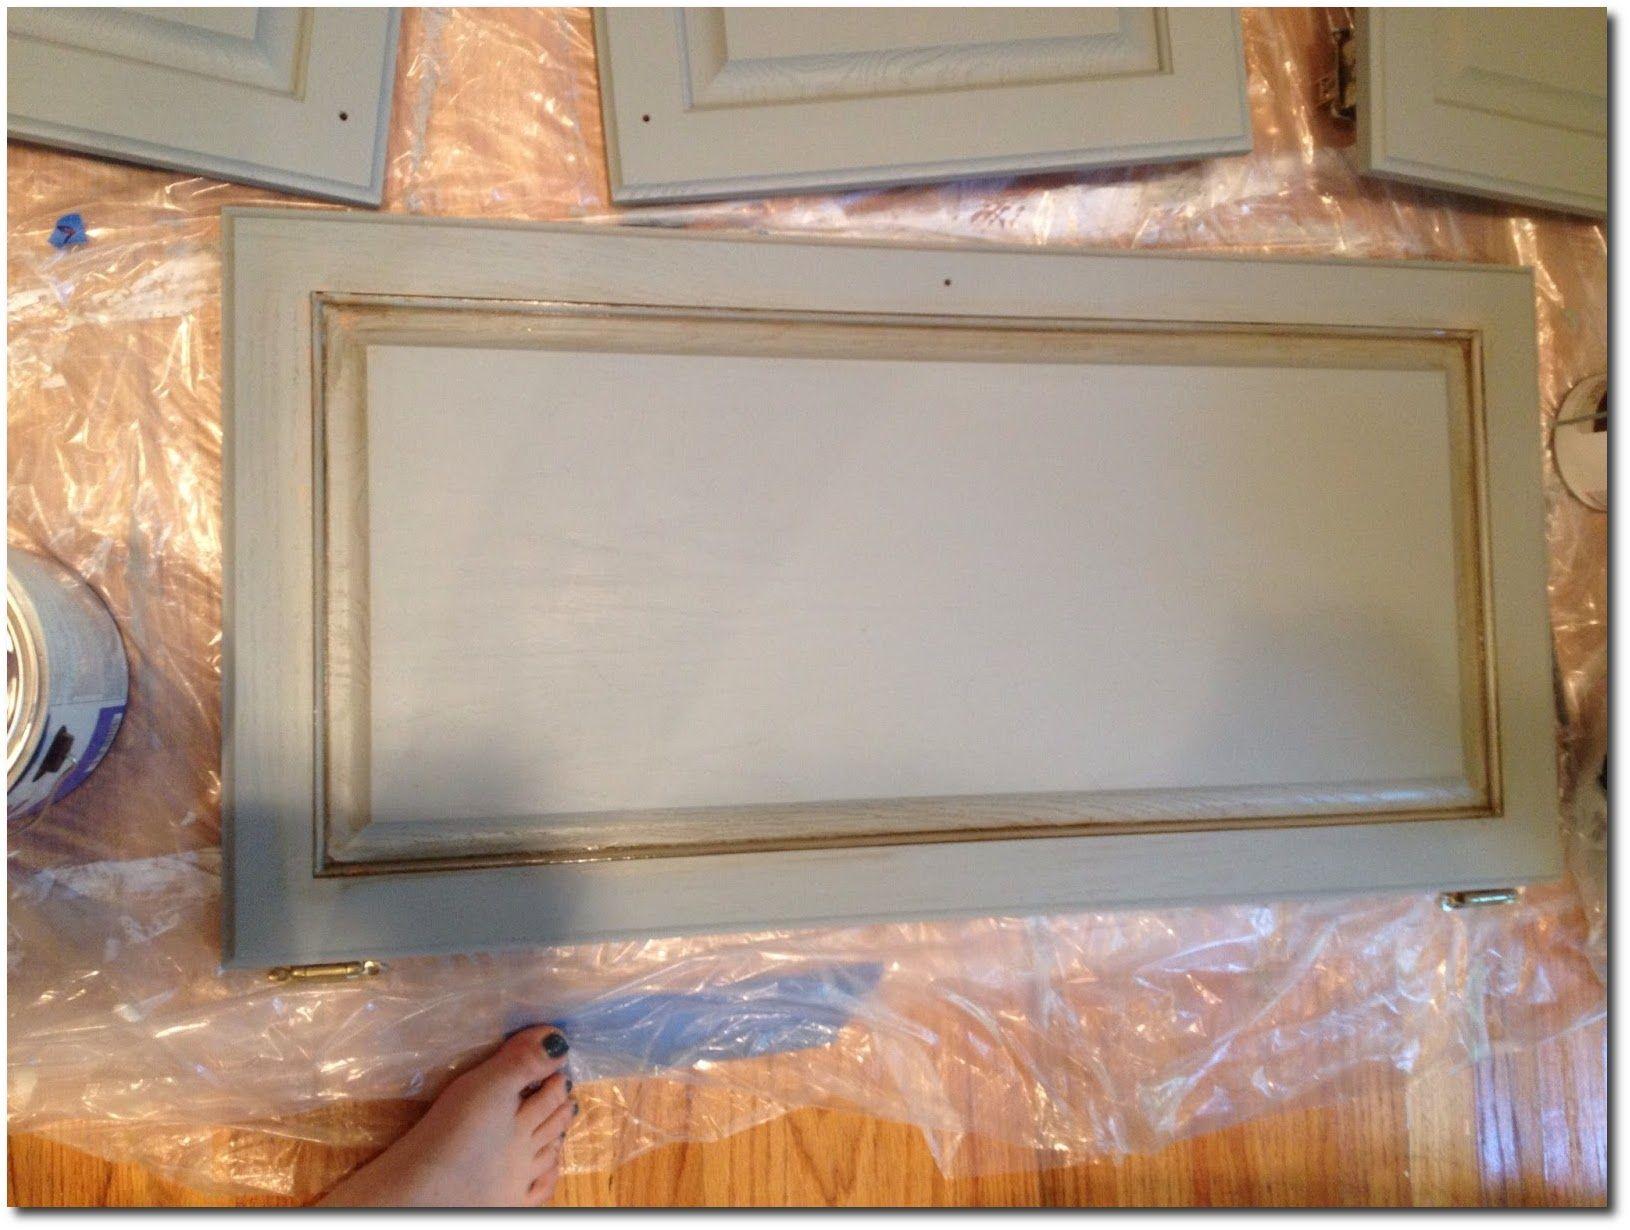 Rustoleum cabinet transformations seaside - Cabinet Transformations In Seaside Bricks And Baubles Blog 2